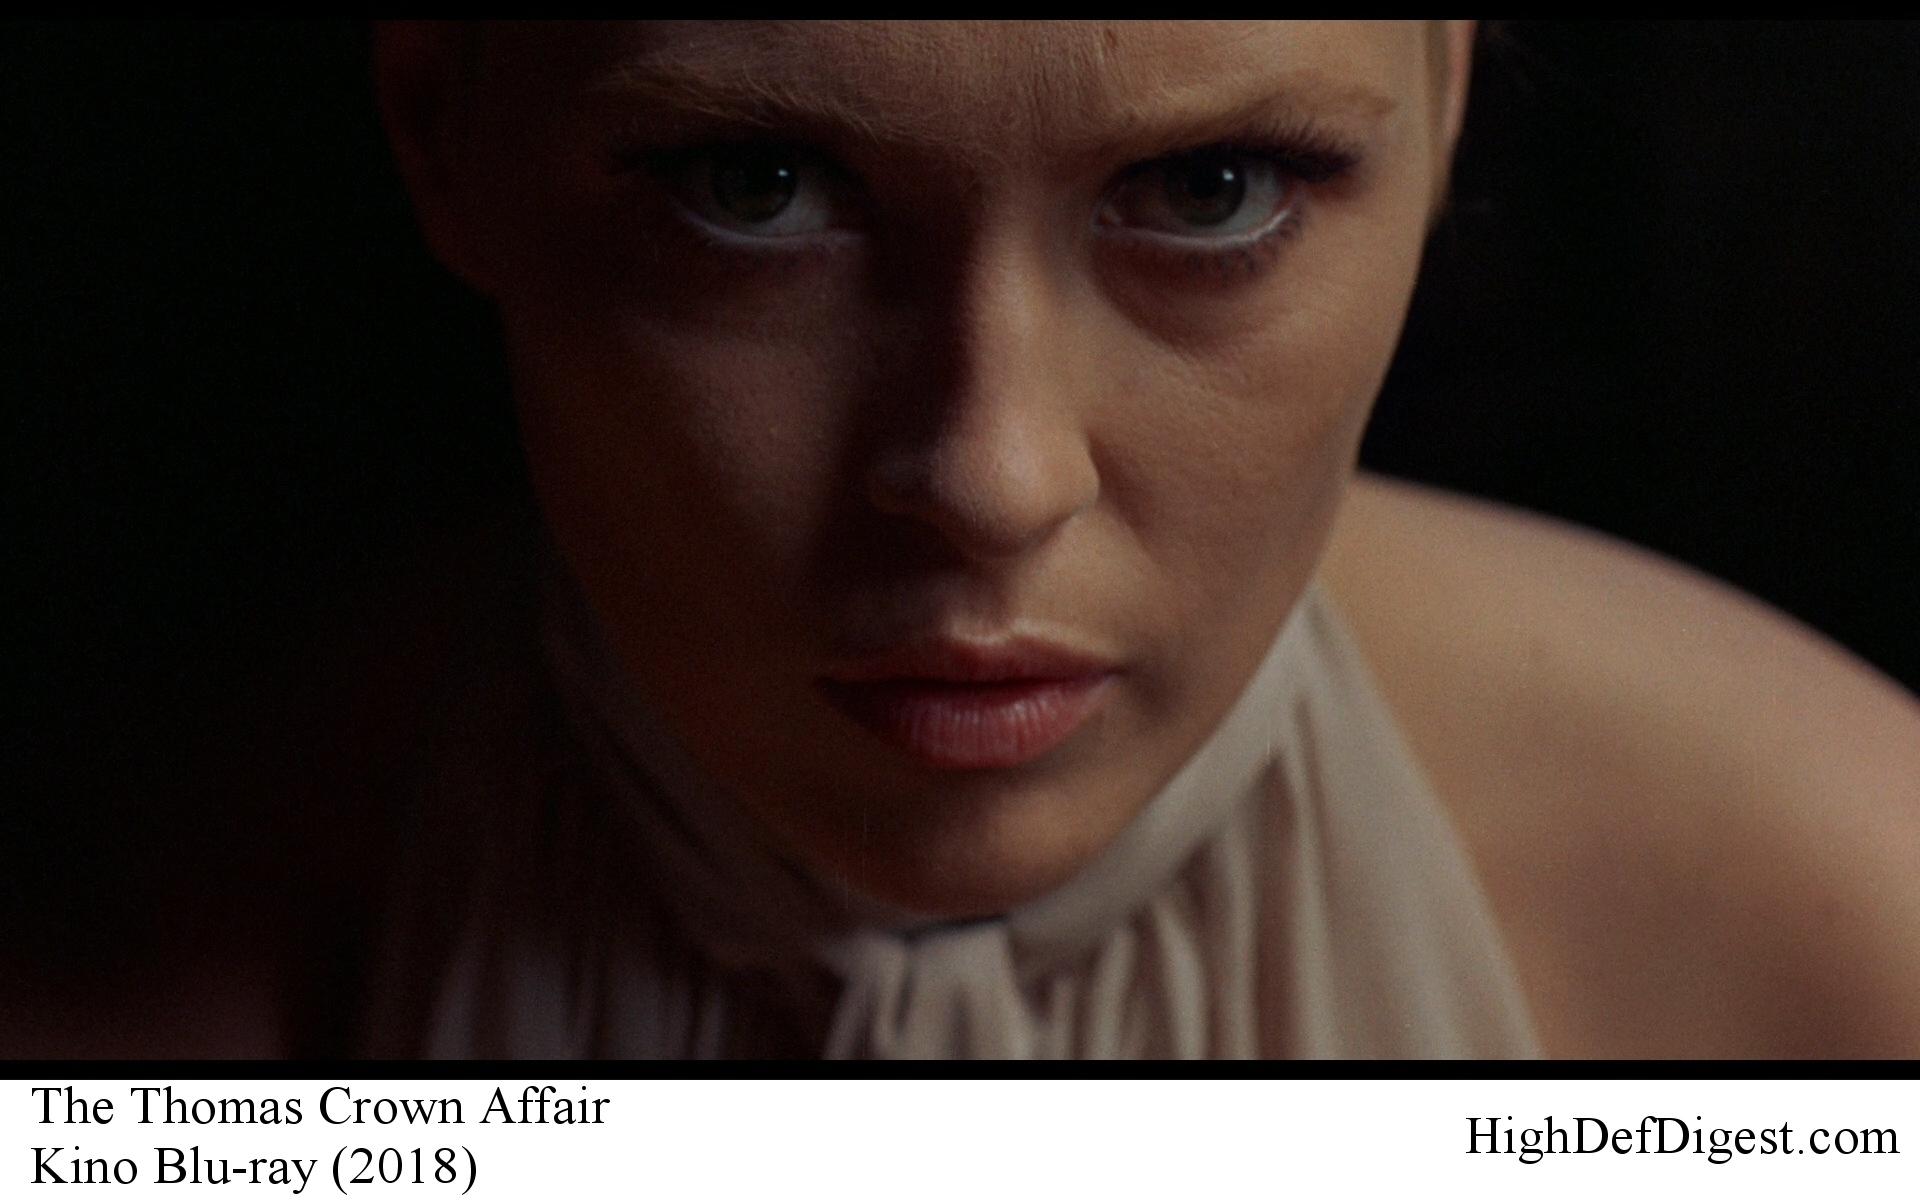 The Thomas Crown Affair - Faye Dunaway Comparison Kino